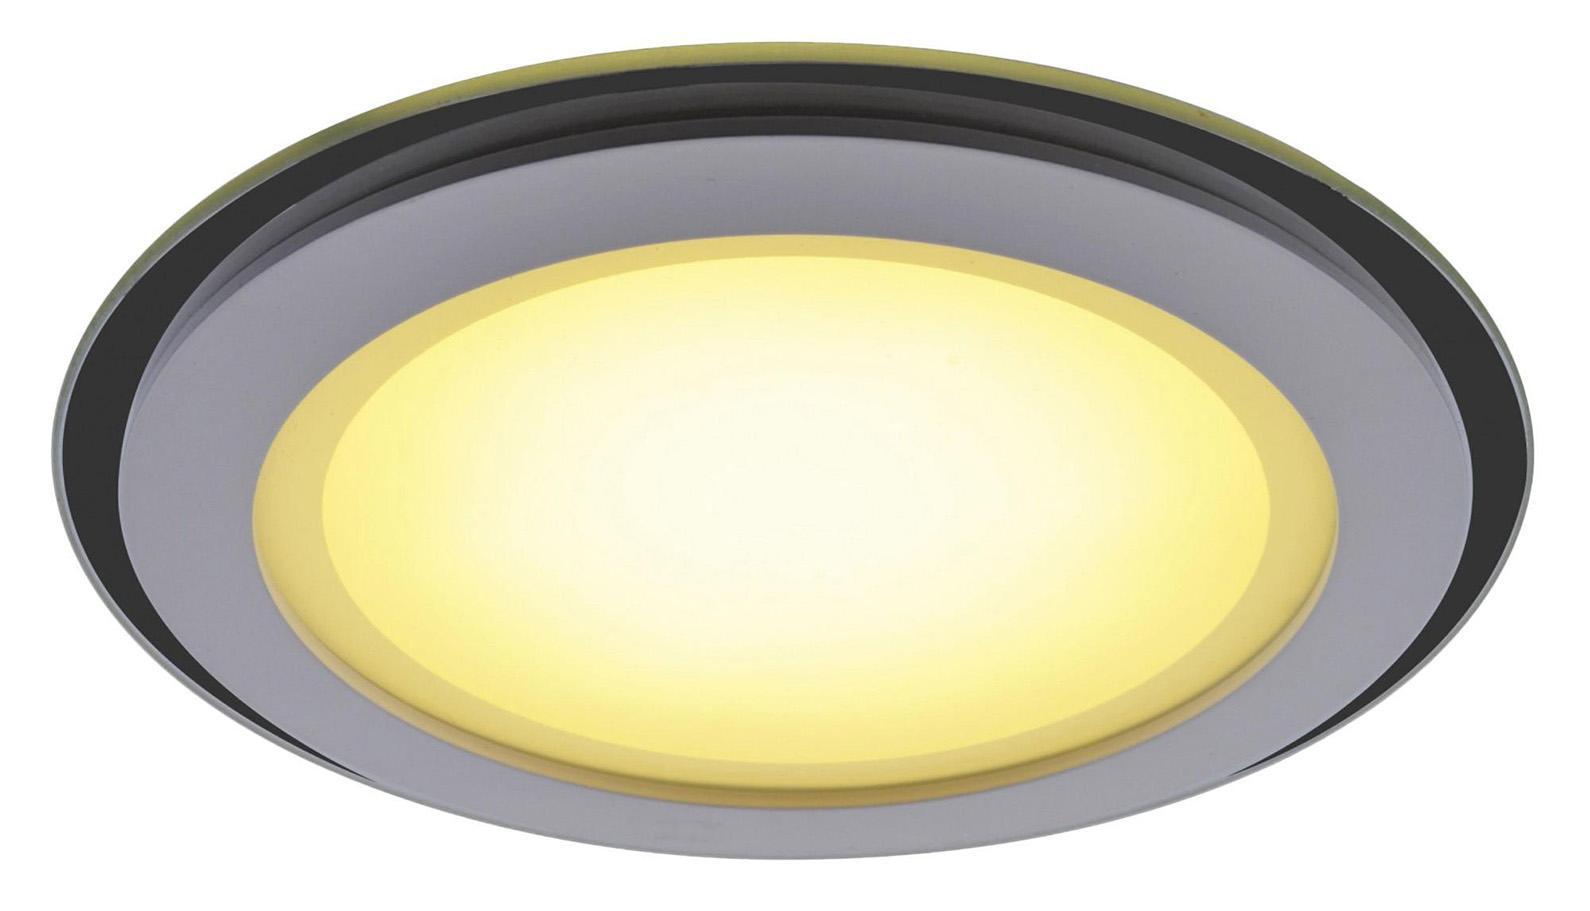 A4118PL-1WH RAGGIO Встраиваемый светильникA4118PL-1WH18W LED; 1440 lm Материал: Арматура: Алюминий / Элемент декора: СтеклоРазмер: 210x210x45Цвет: Белый